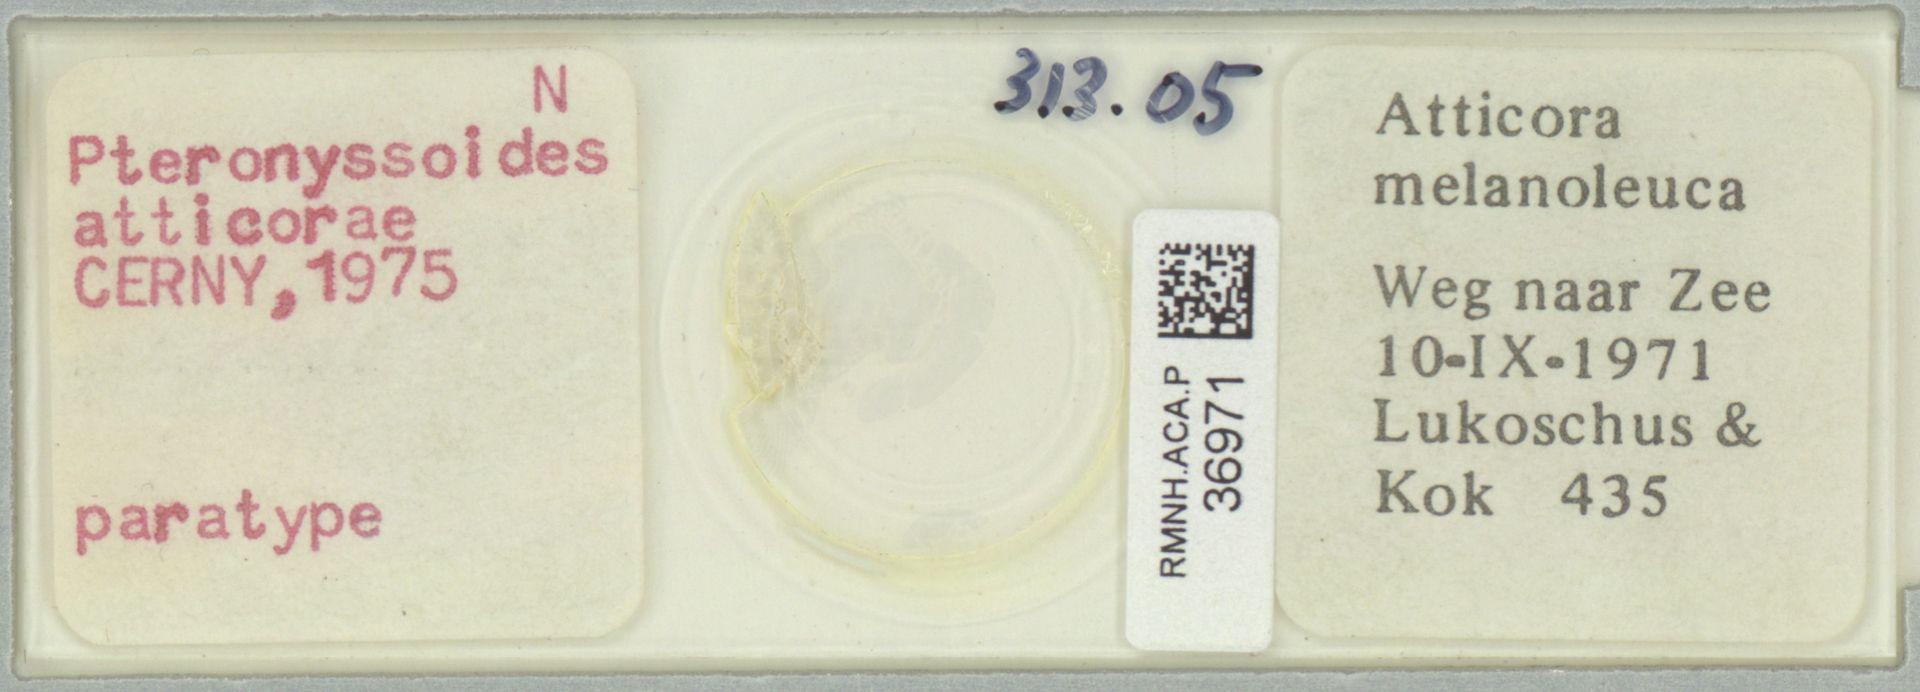 RMNH.ACA.P.36971 | Pteronyssoides atticorae Cerny, 1975